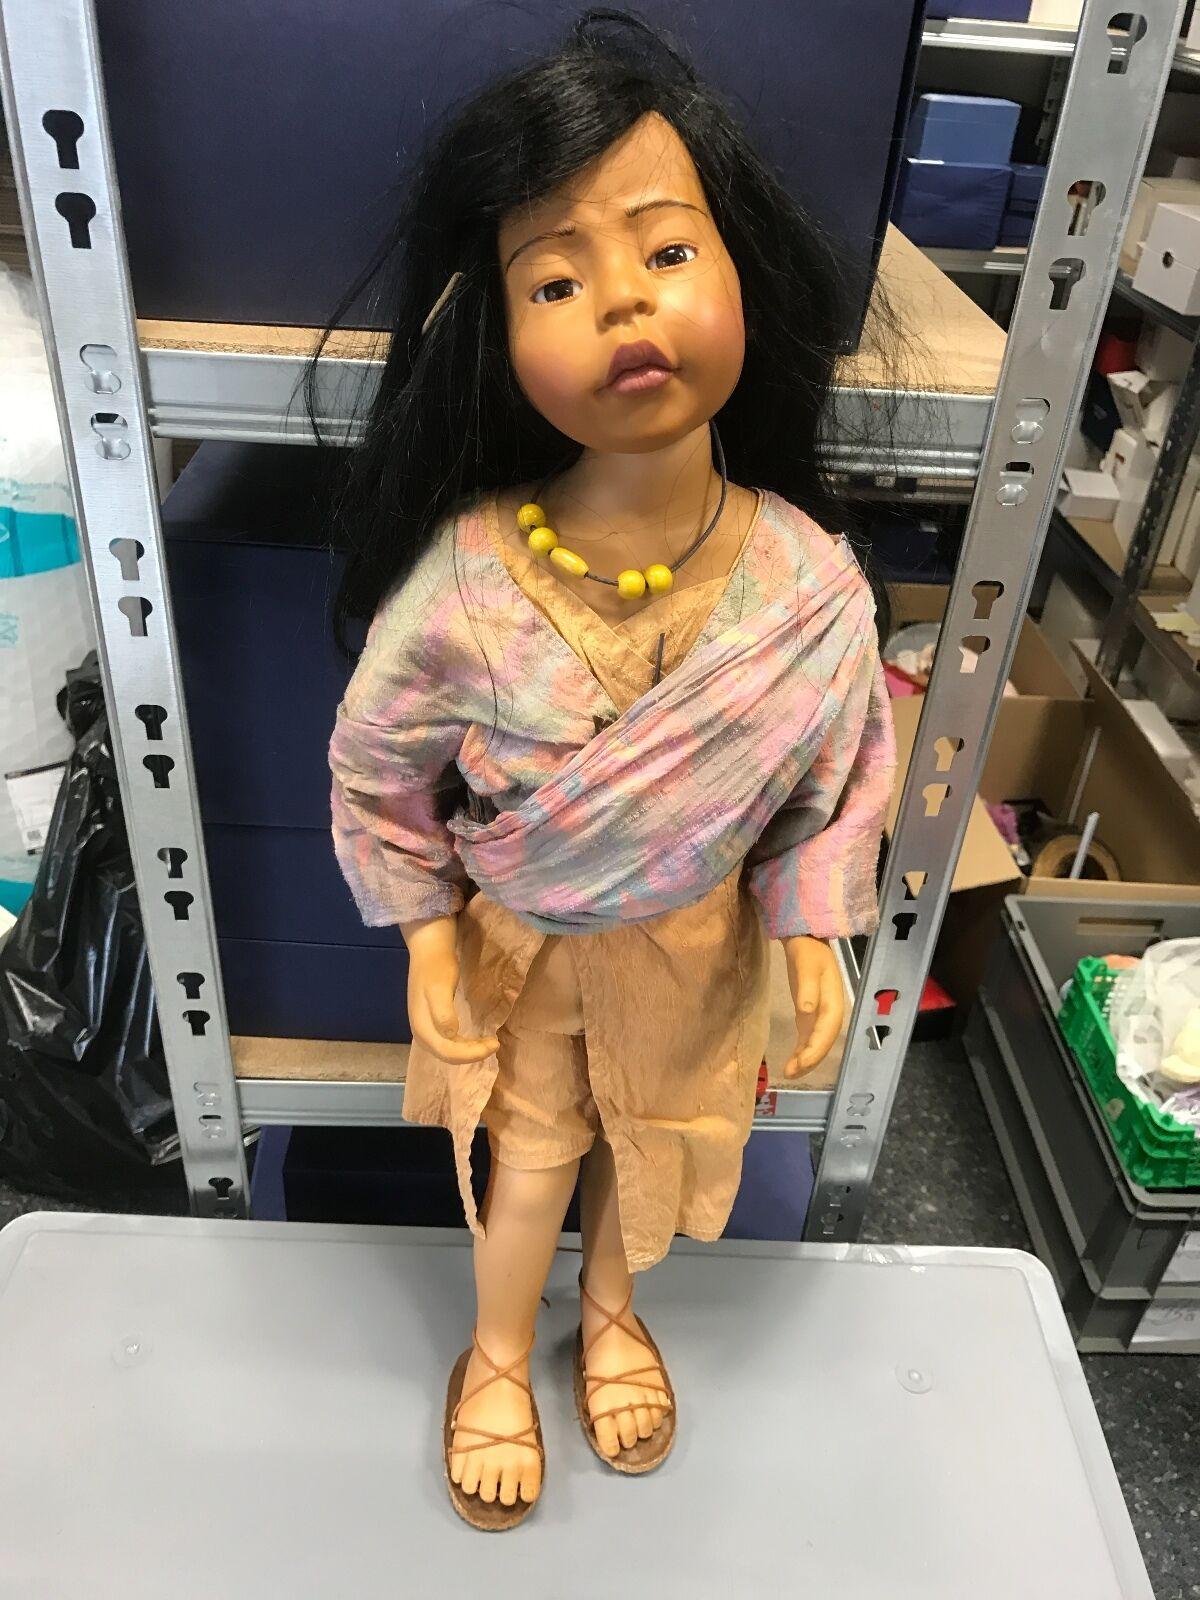 Philip Heath muñeca de vinilo 58 cm. firmado    impecable